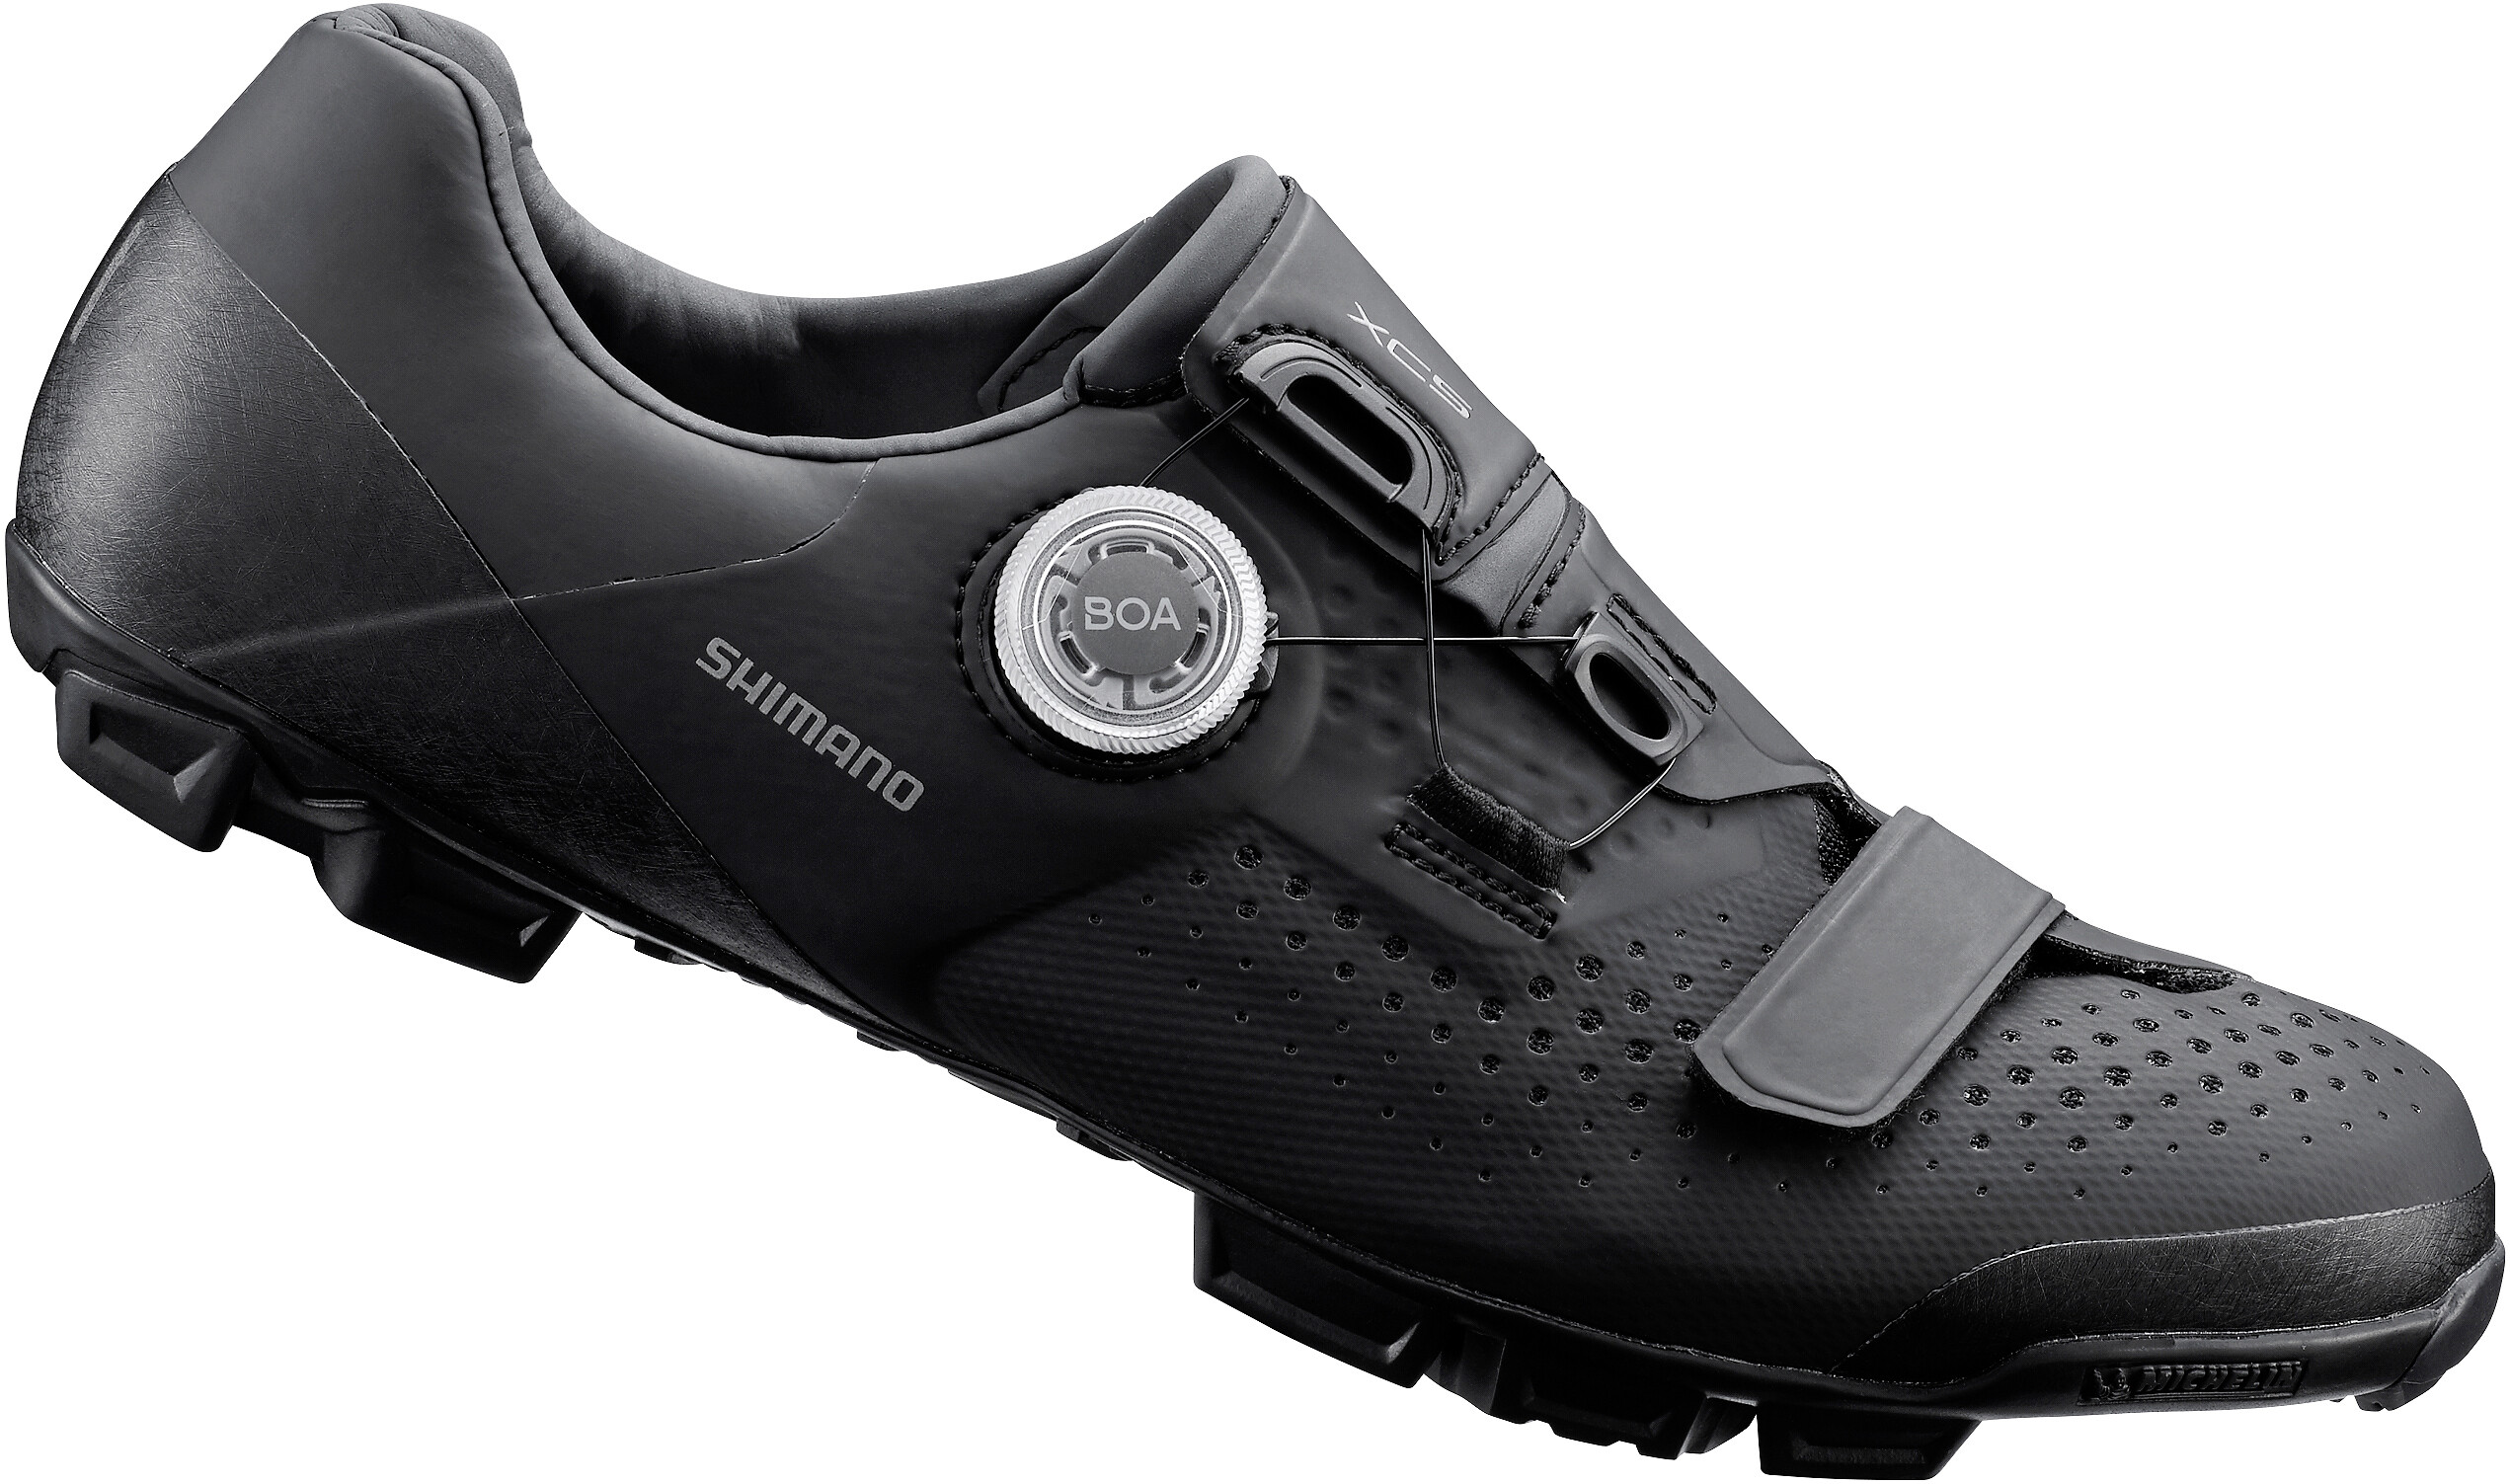 SHIMANO SH-XC5 Fahrradschuhe Black 2019 Rad-Schuhe Radsport-Schuhe